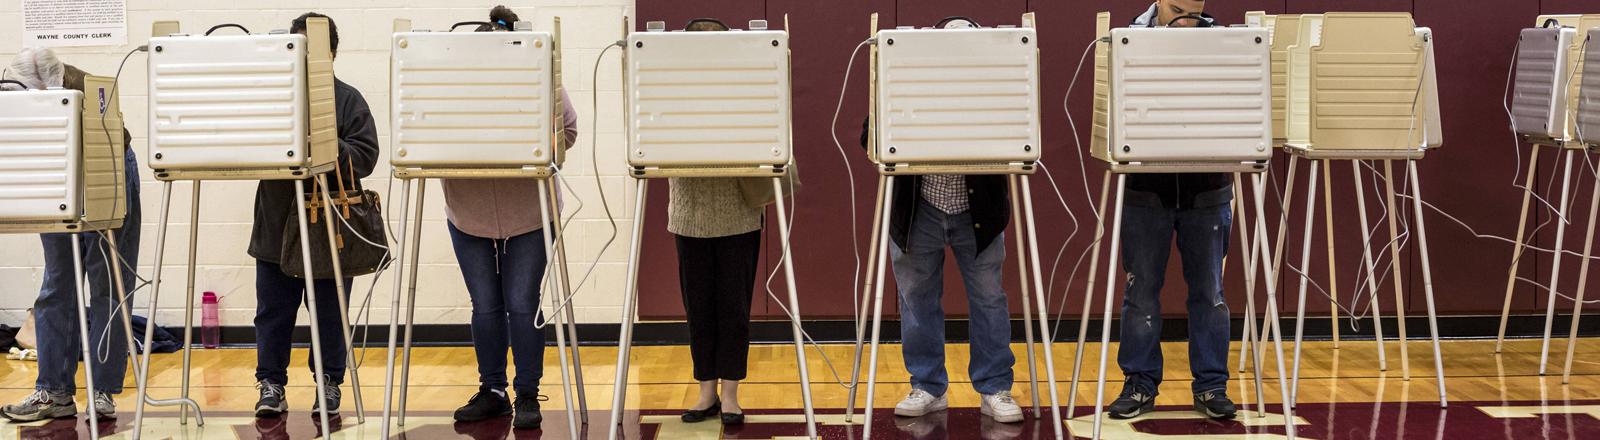 Wahl in Michigan